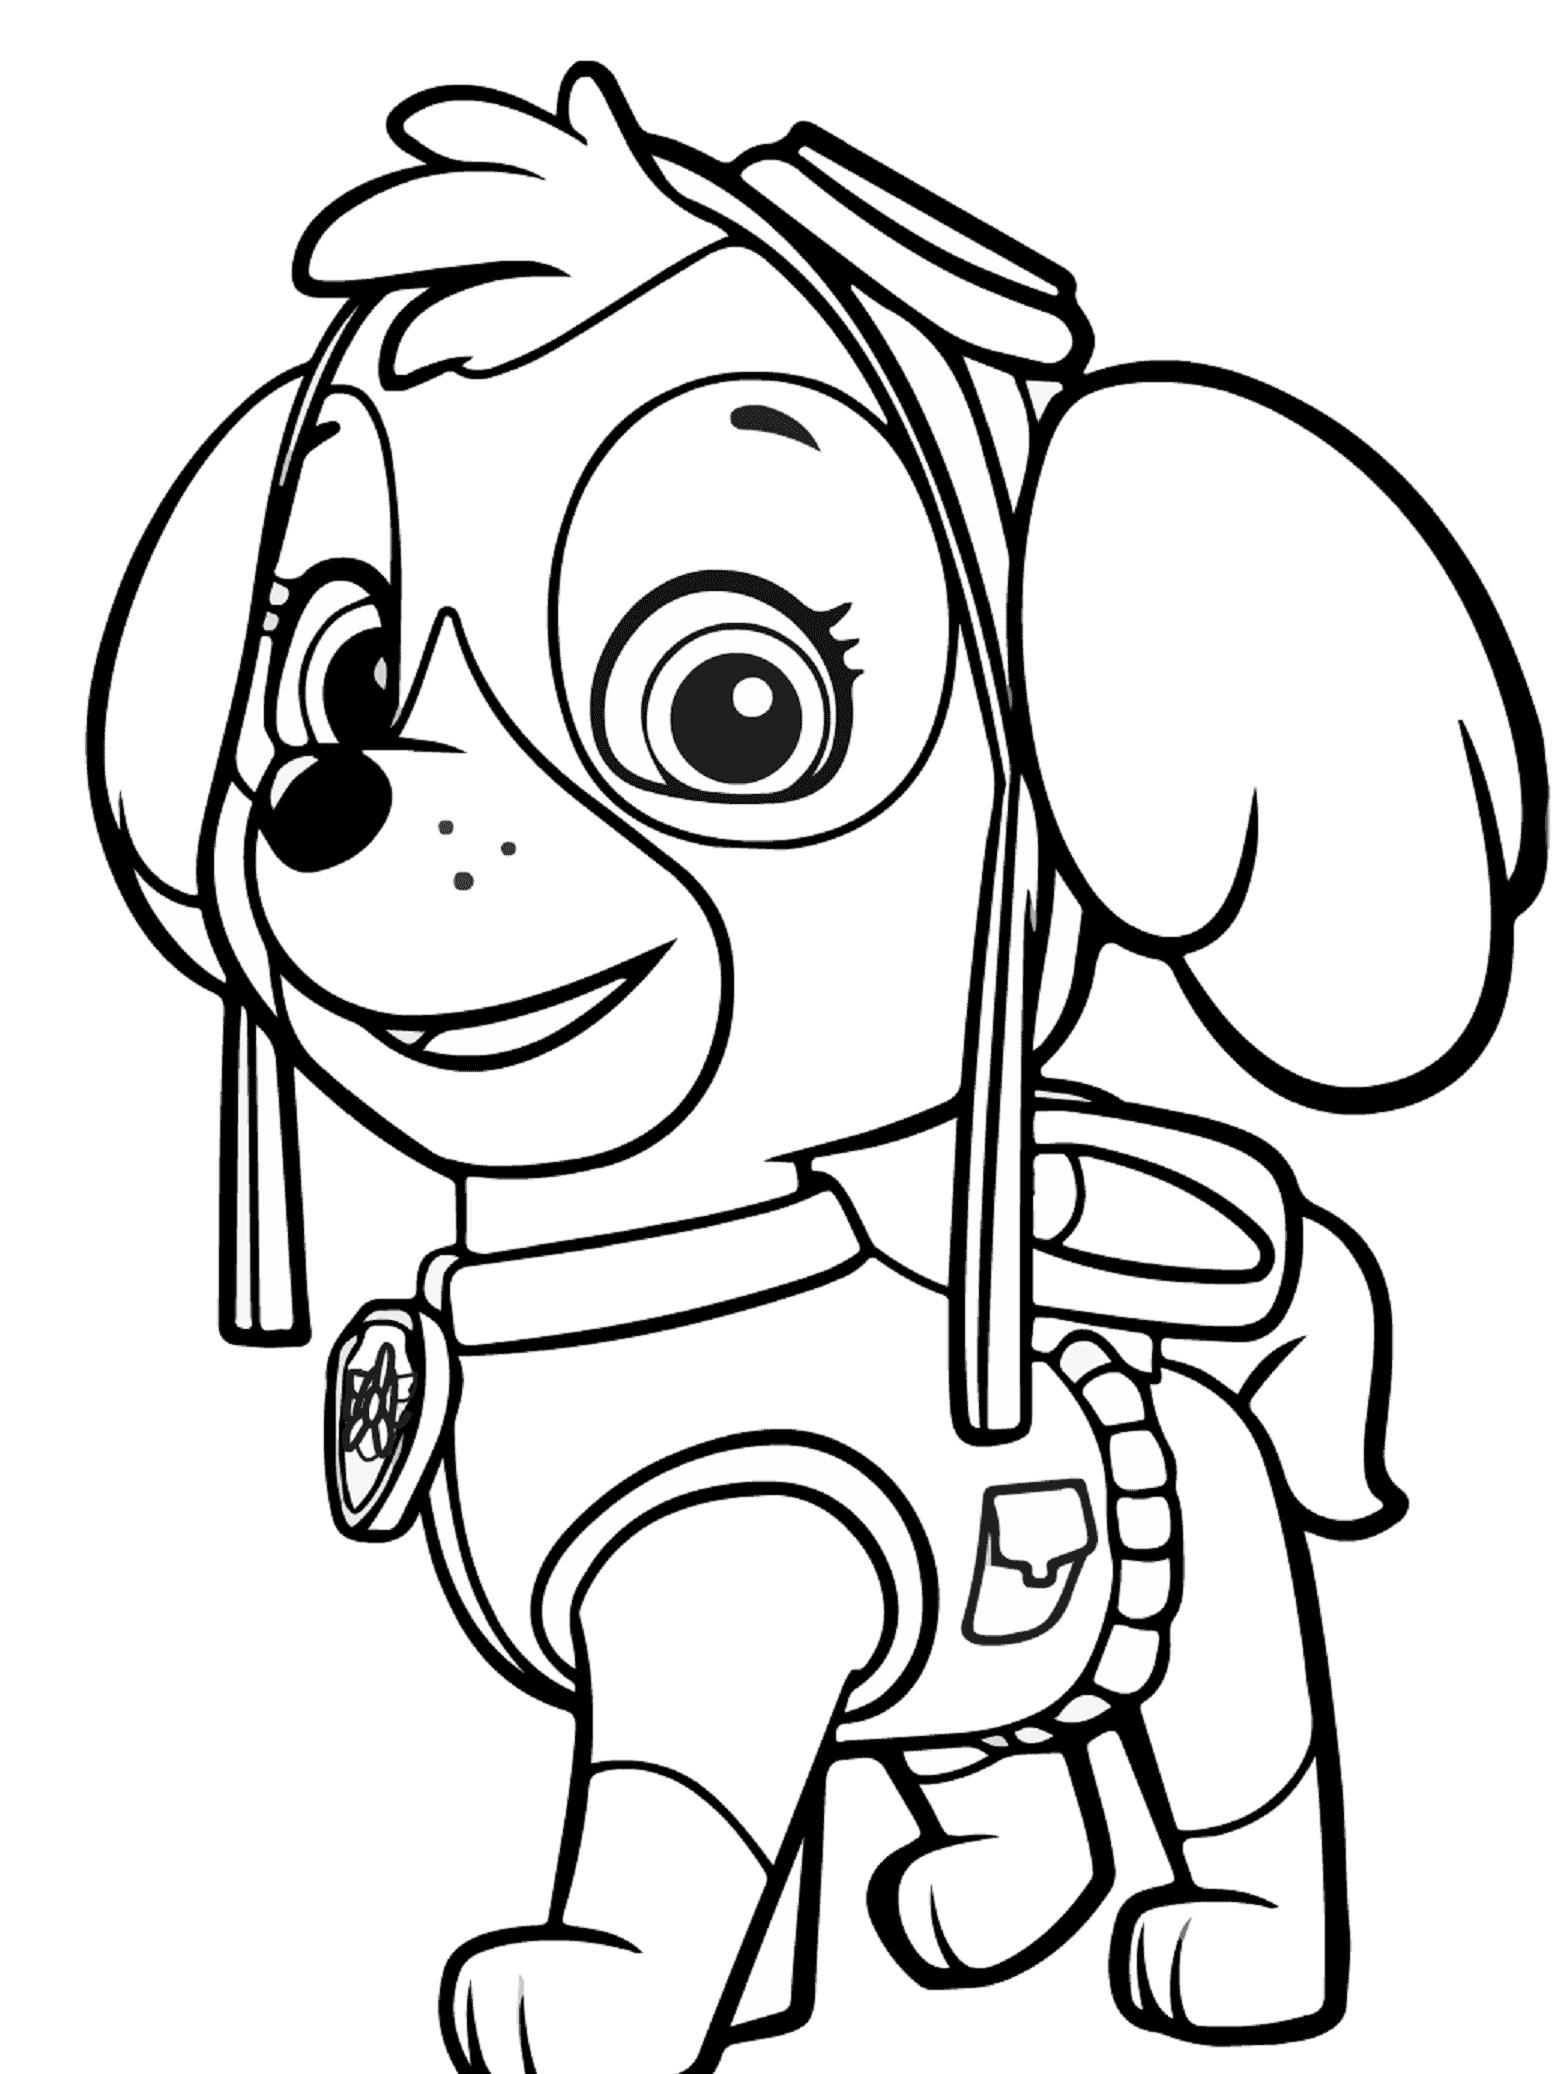 Dibujo de Paw Patrol Skye para colorear e1549494271500